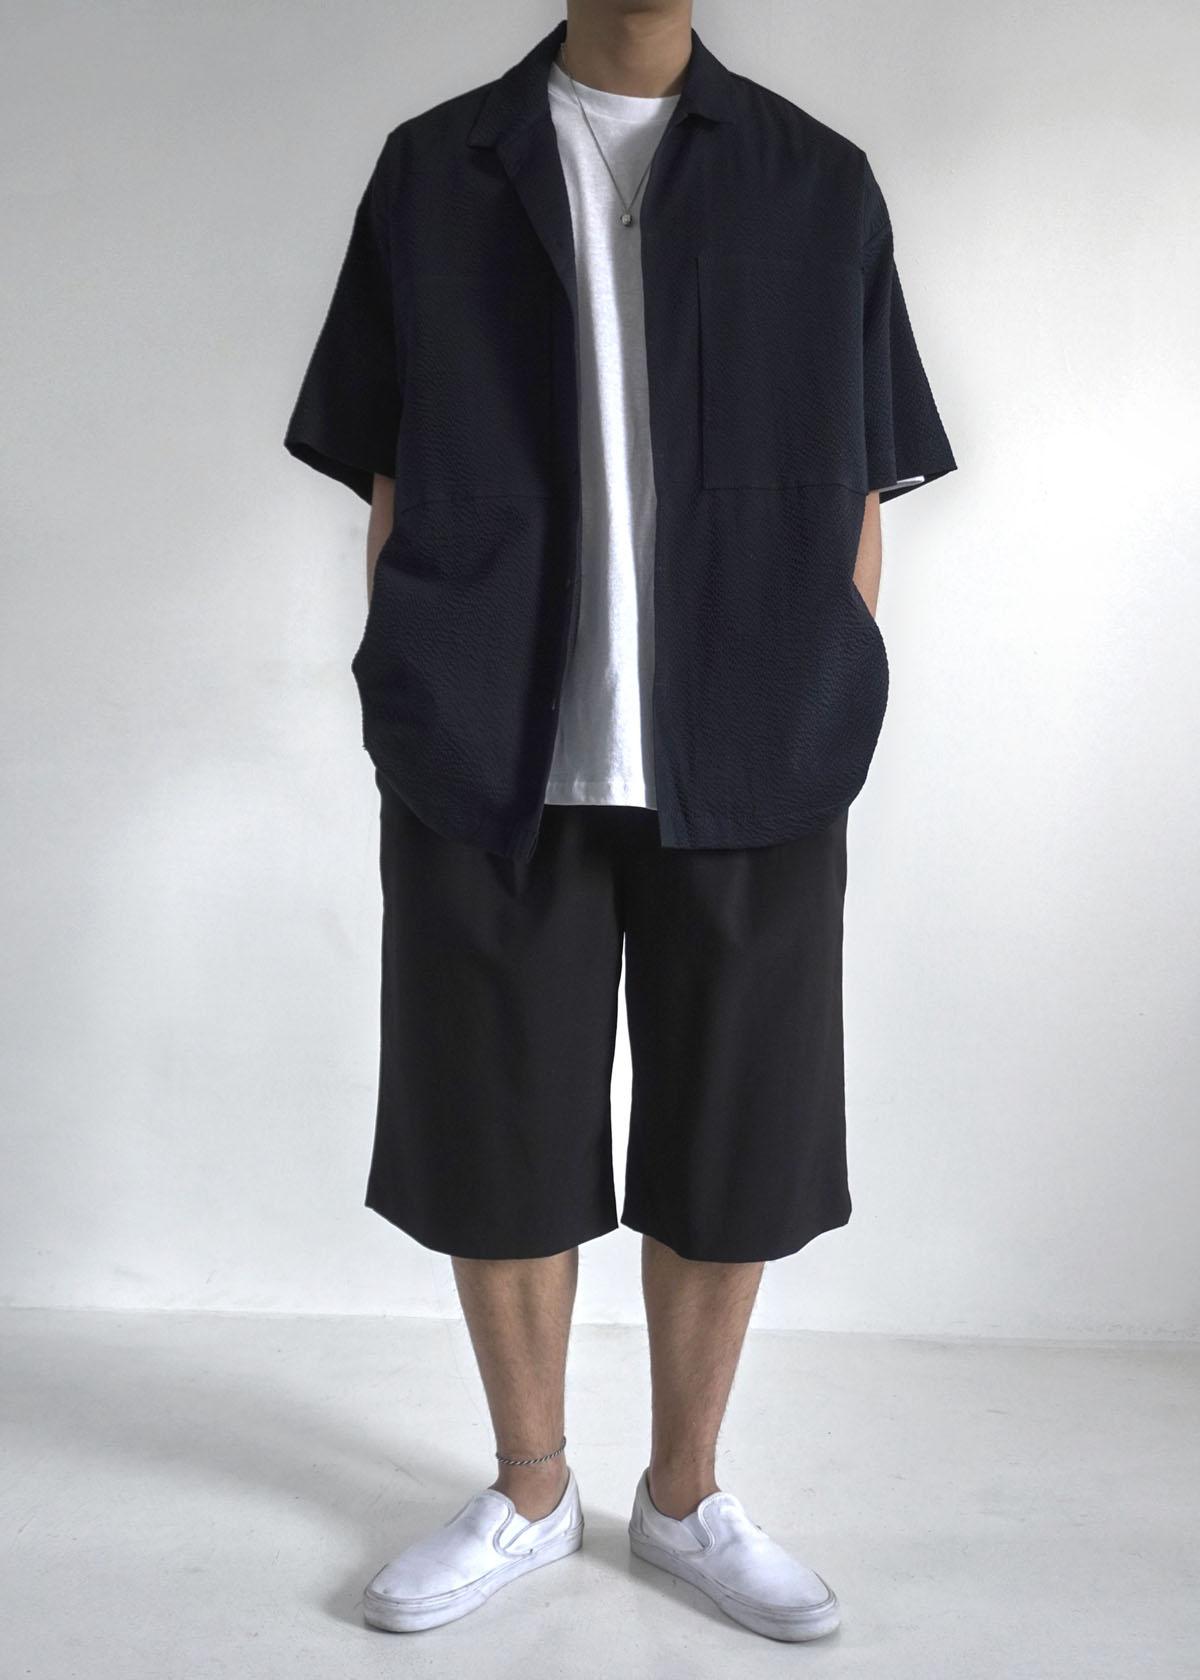 6' Silky Black Wide Half Shorts